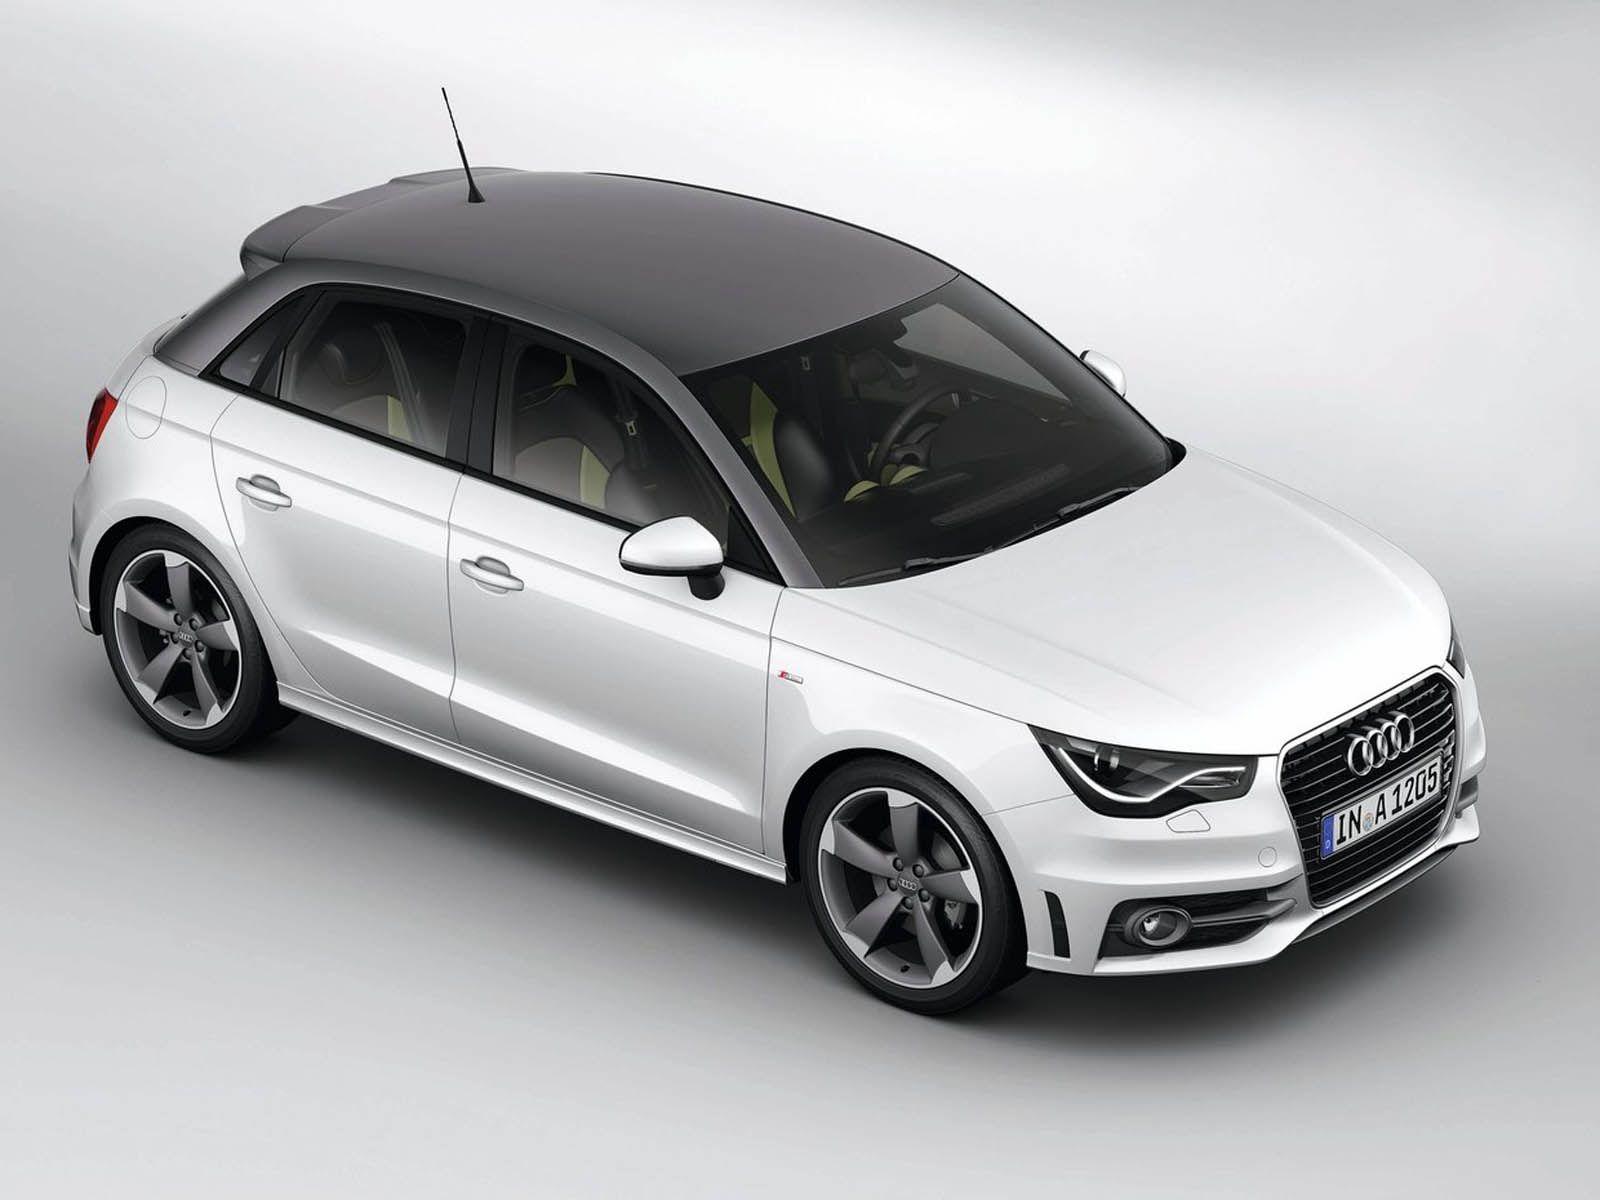 Pin By Sheila On Products I Love Audi A1 Sportback Audi A1 Audi A1 White